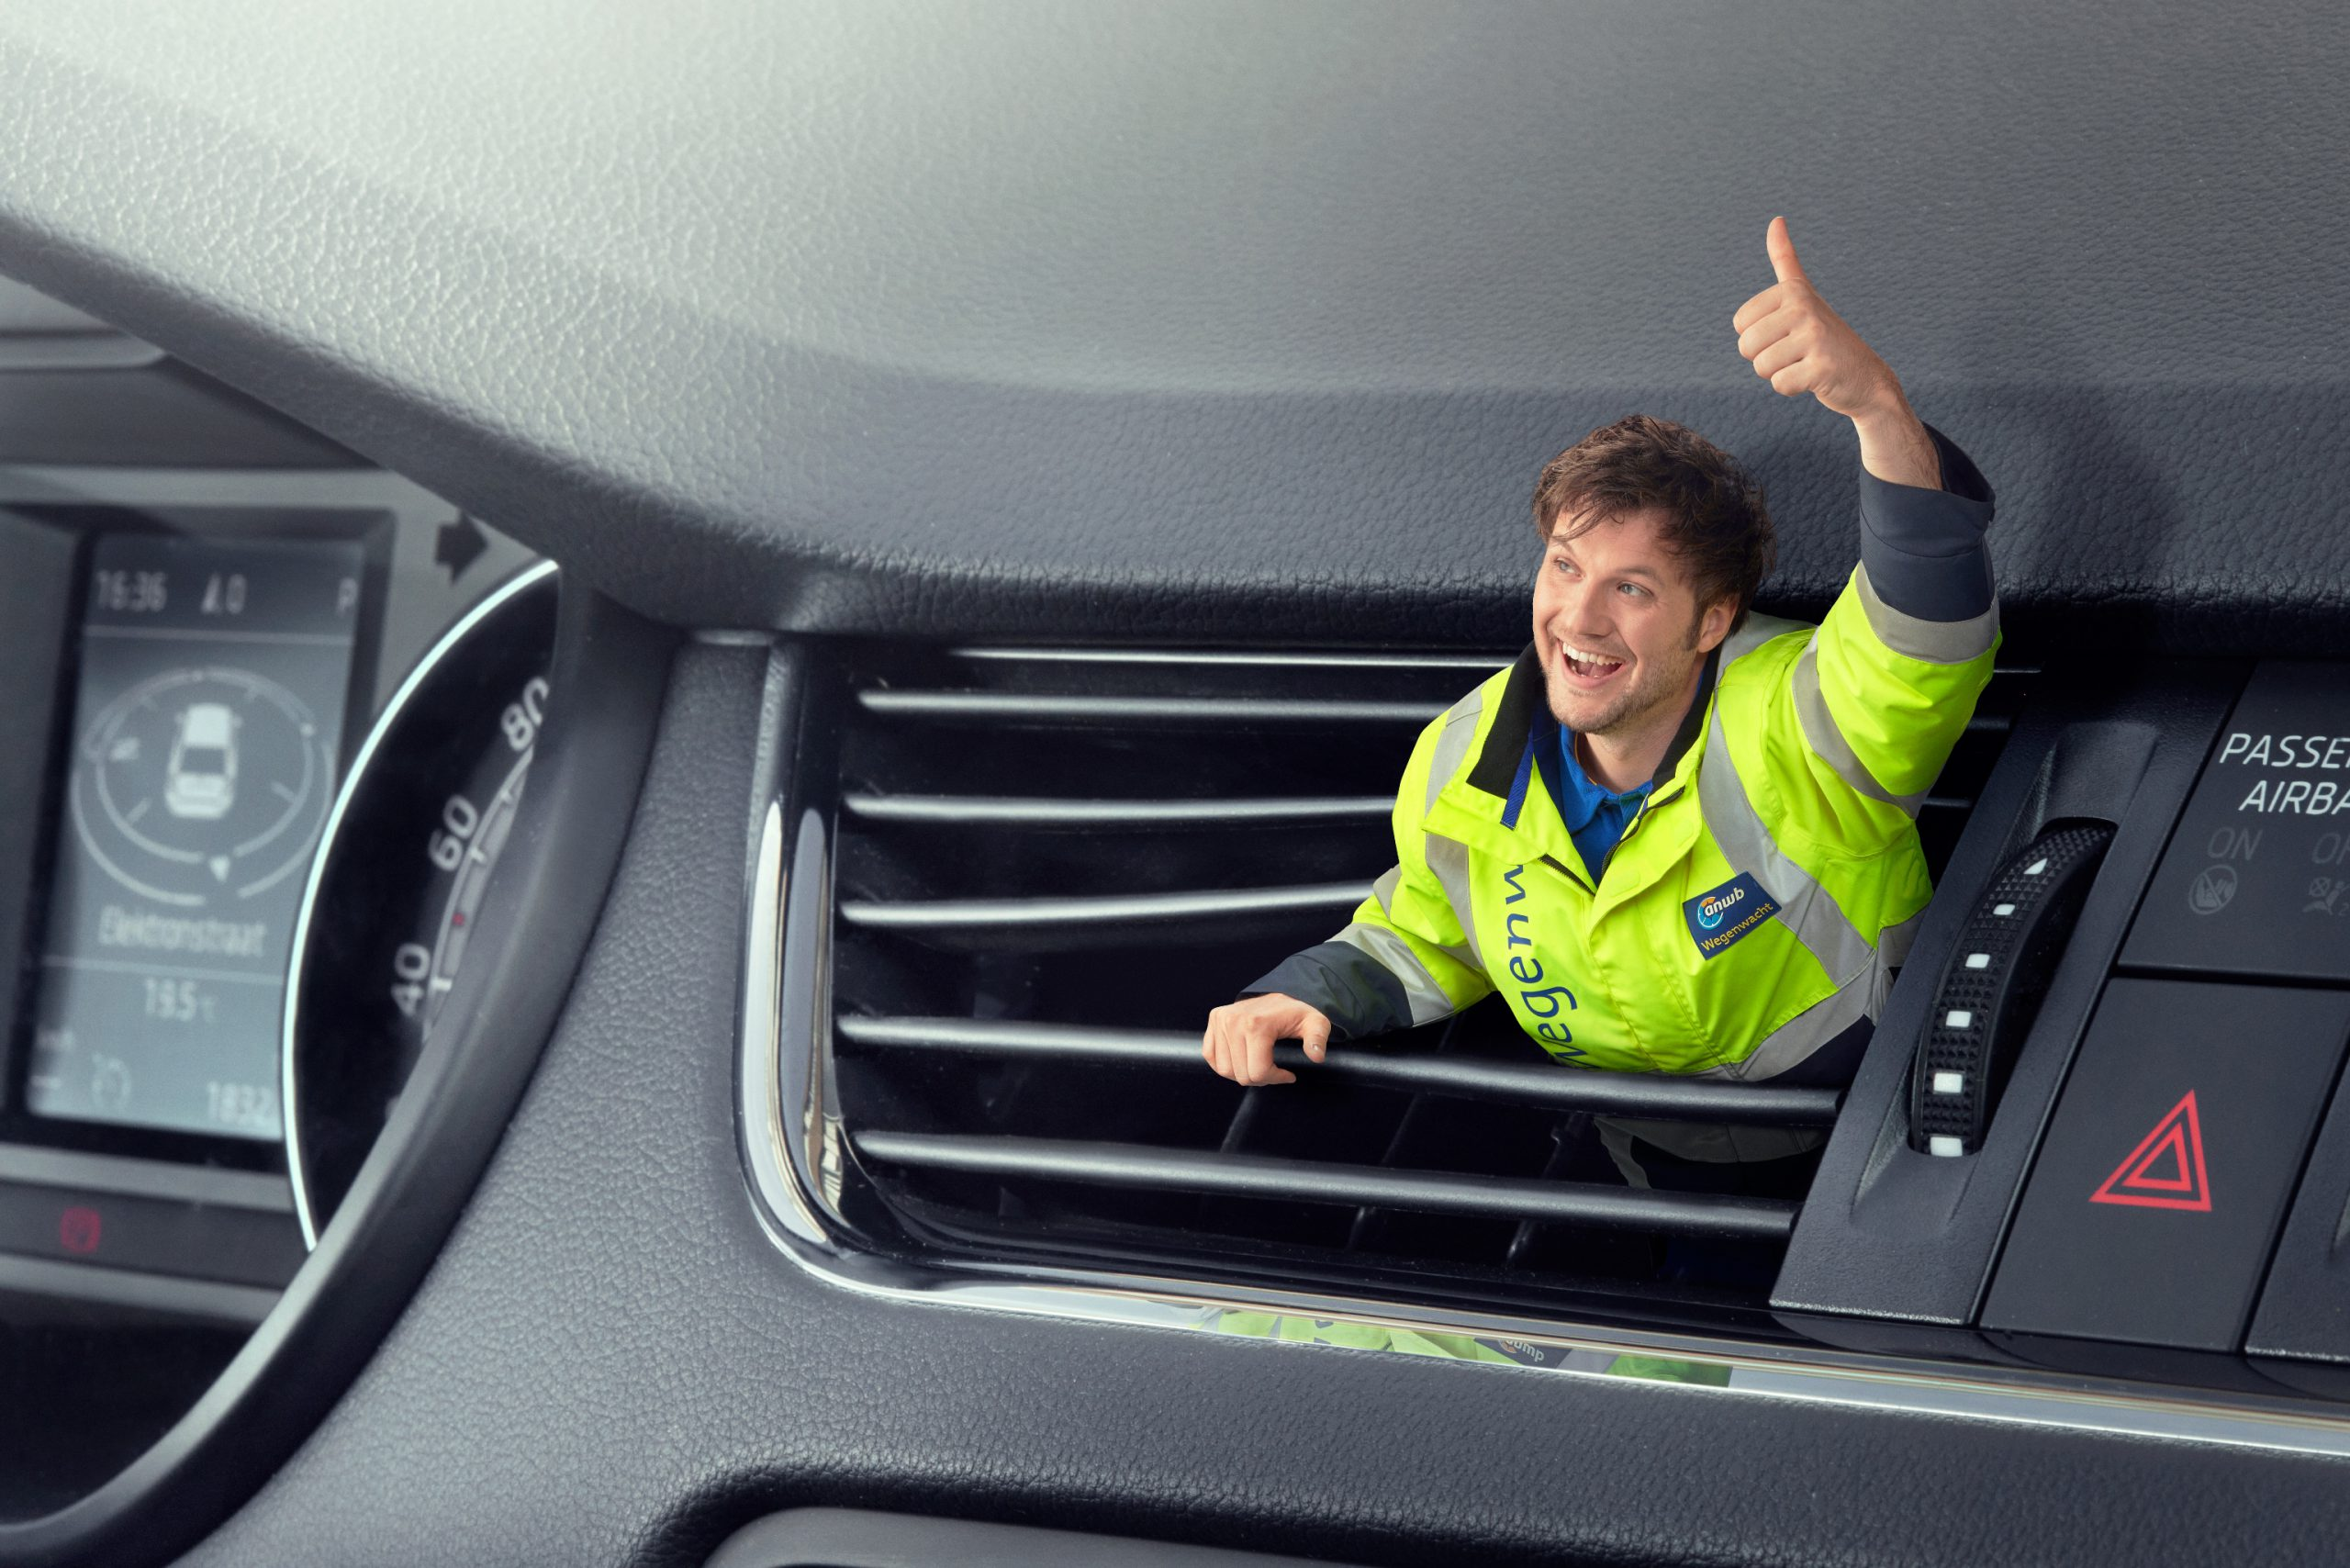 Campagne smart Driver